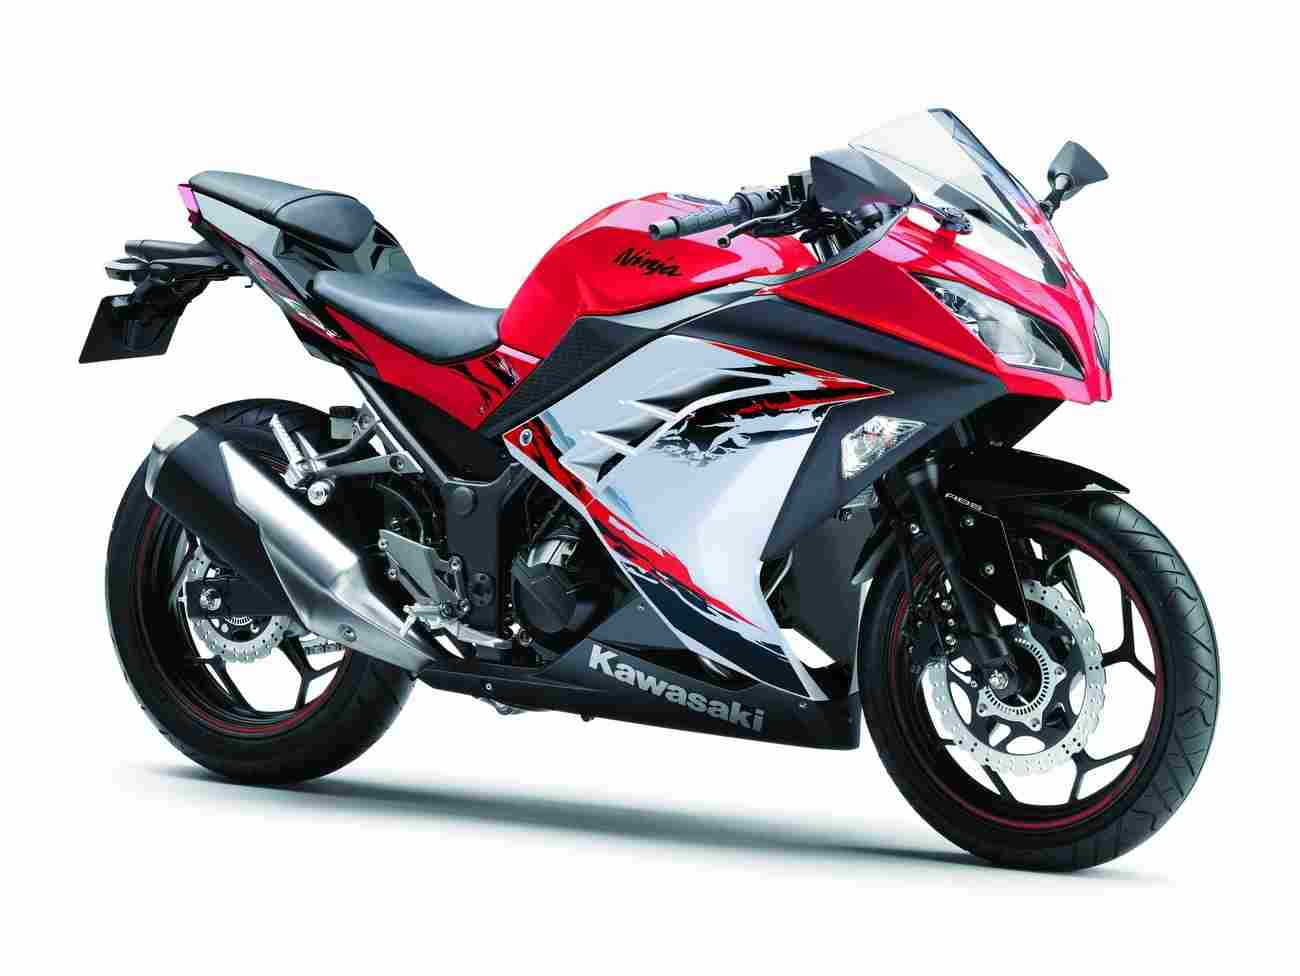 Daftar Harga Motor Kawasaki Ninja Blitz Athlete Baru Bekas